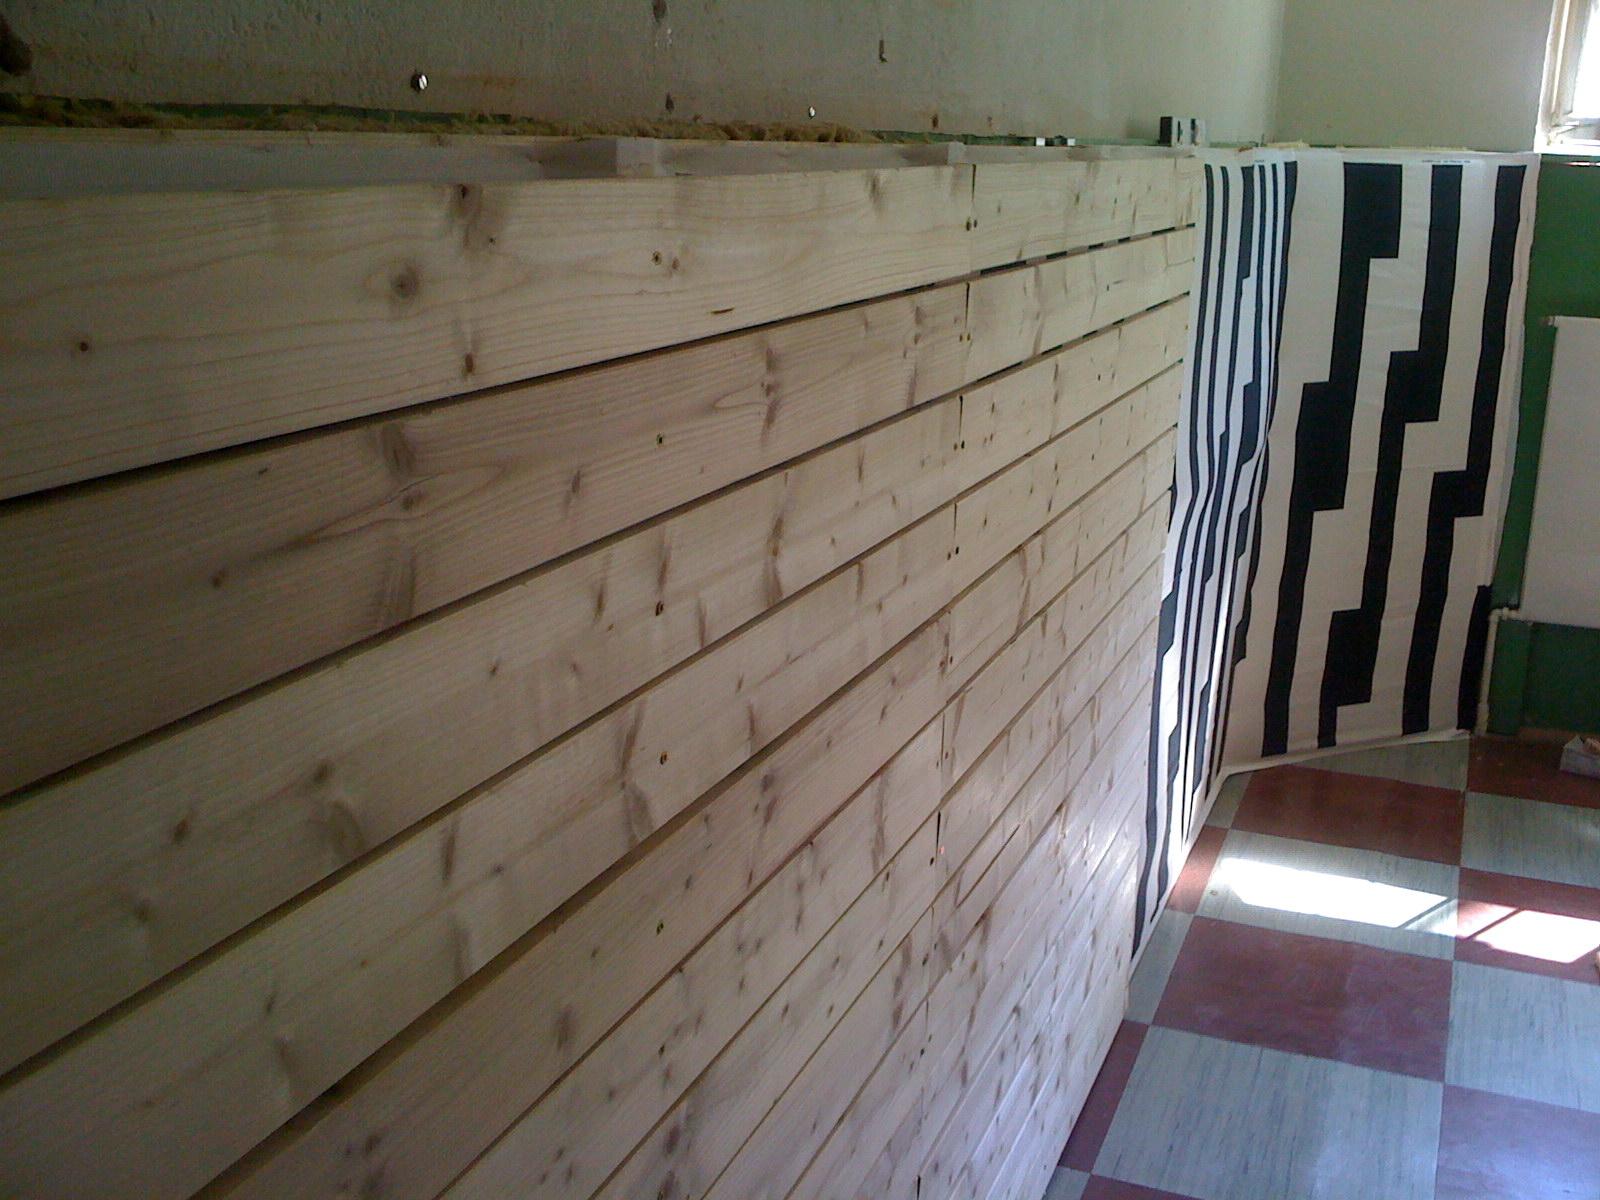 Wandverkleidung Holz Meister ~ Wandverkleidung Mit Holz Inklusive Dekorativem Raumteiler Pictures